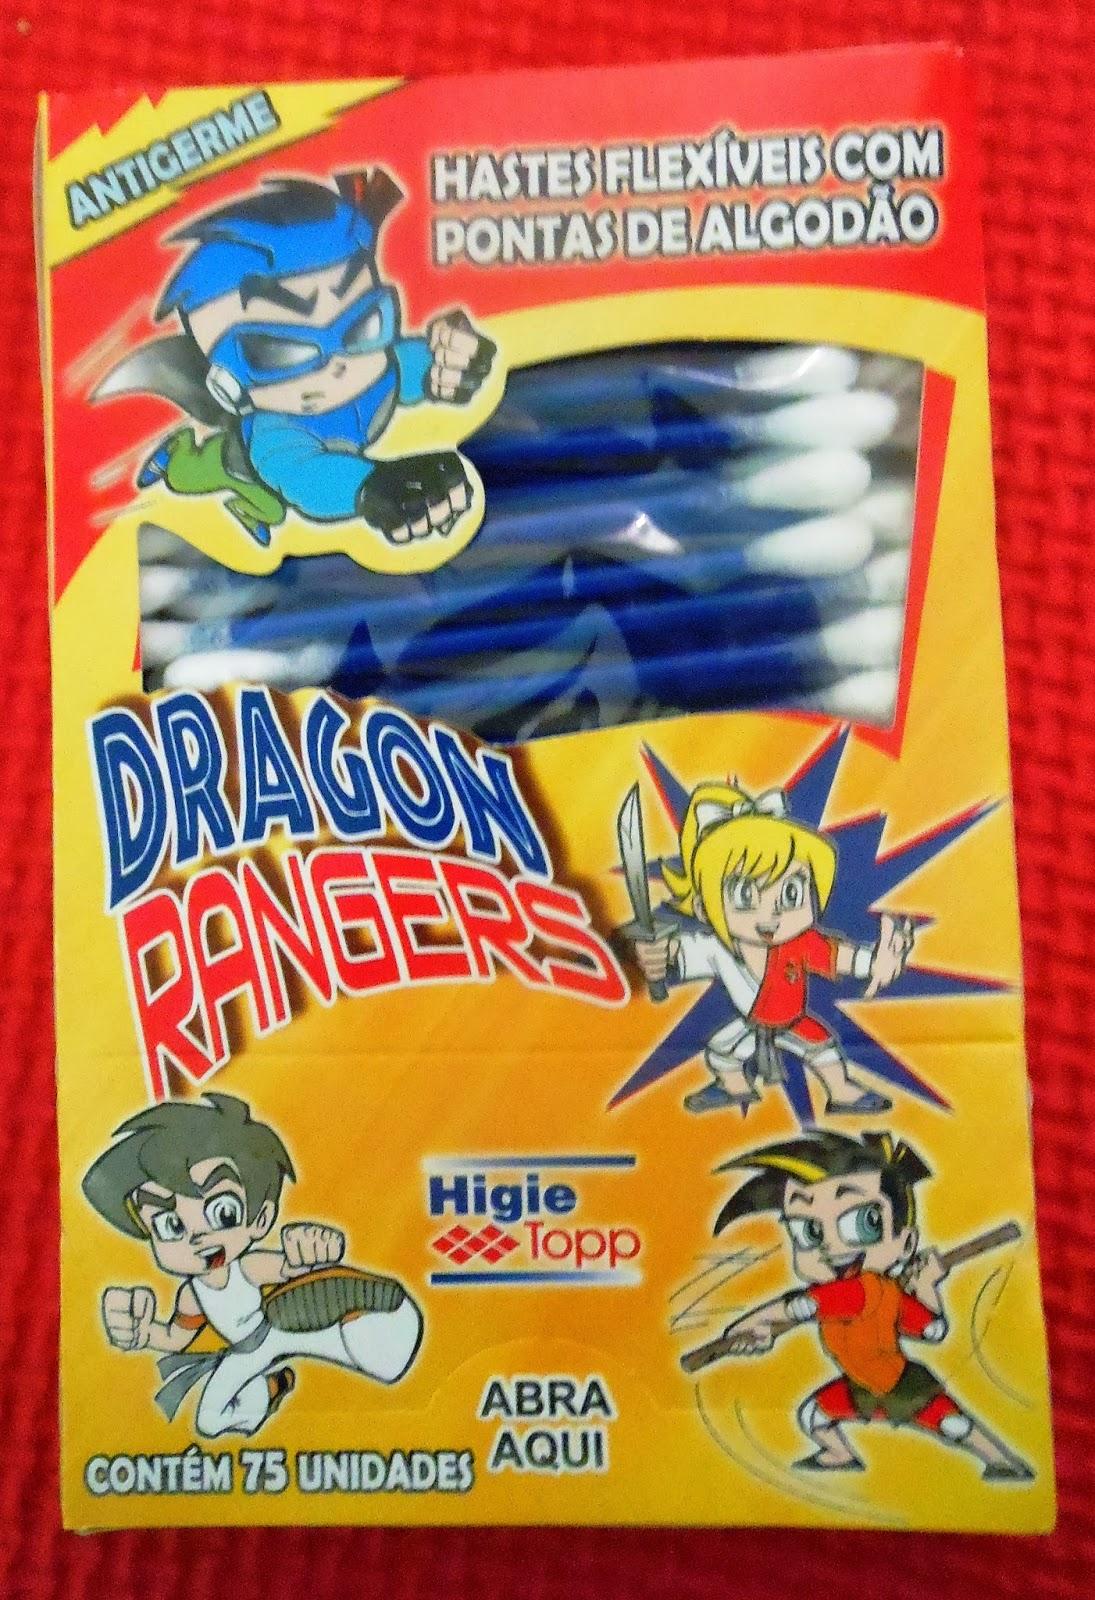 Dragon Ranger hastes flexíveis cotton line